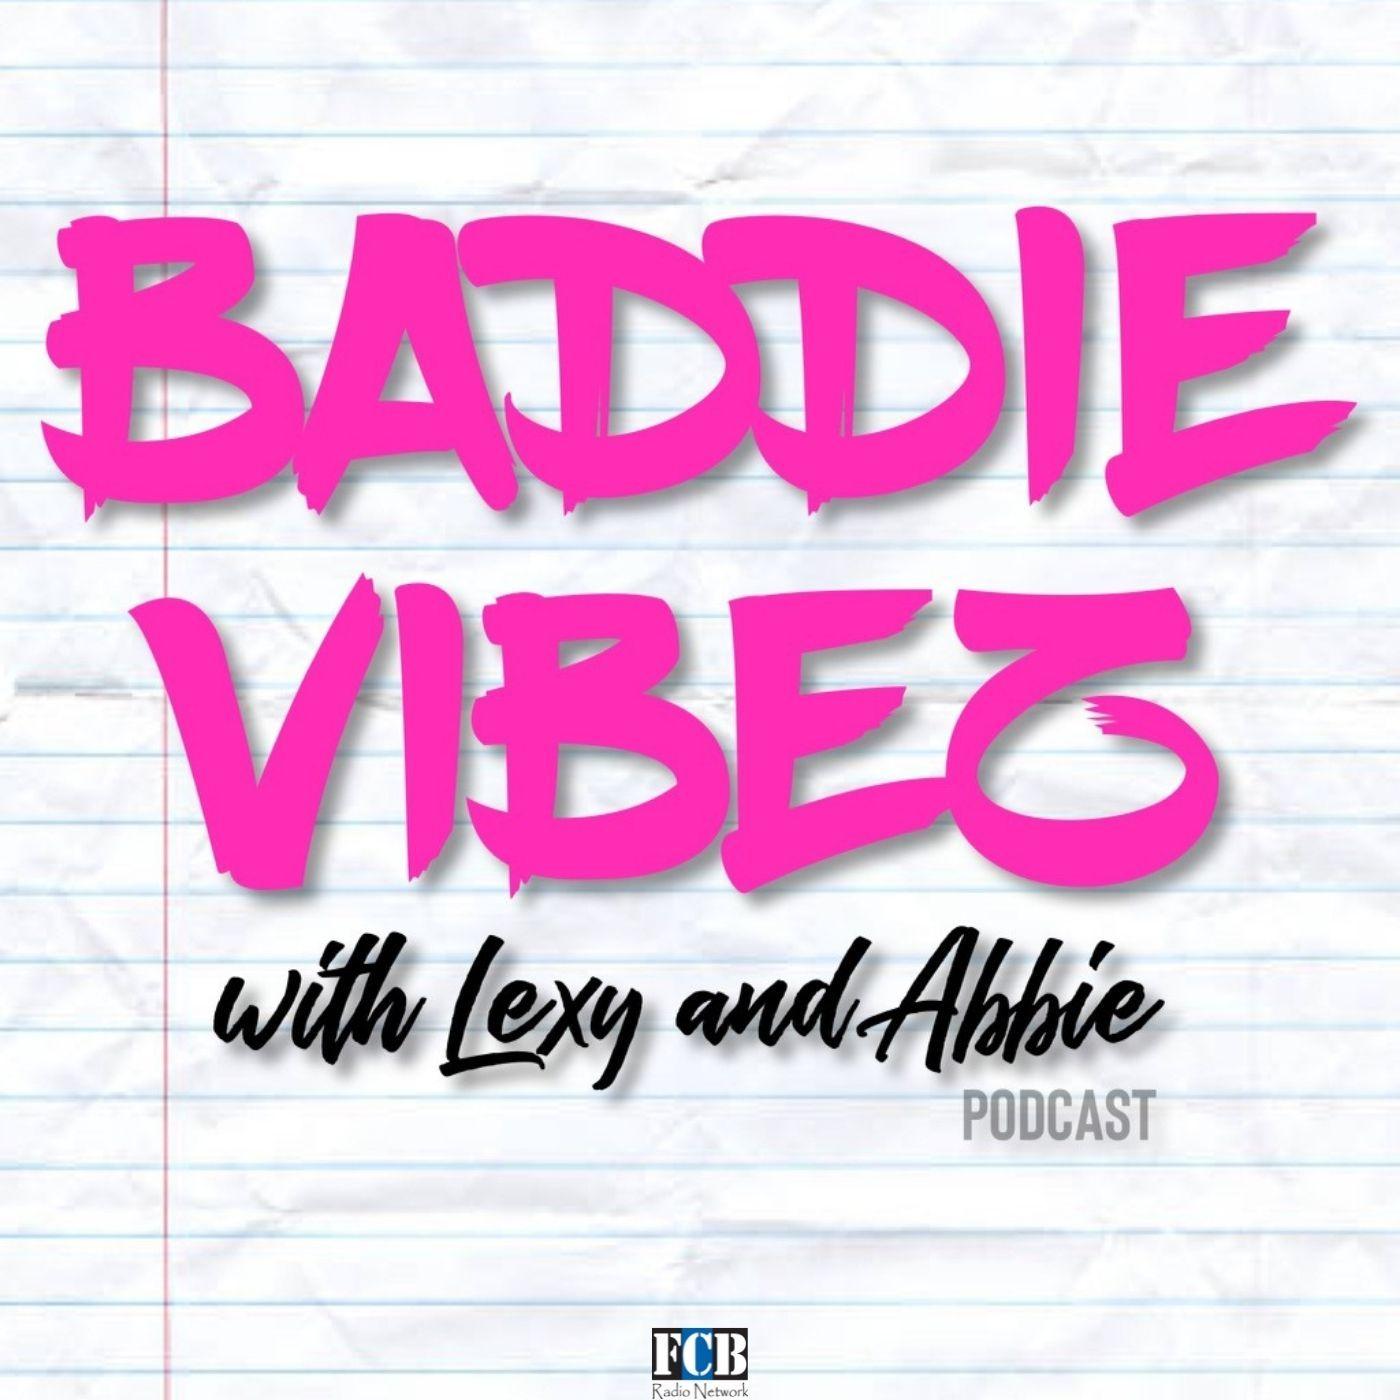 Baddie Vibez with Lexy and Abbie